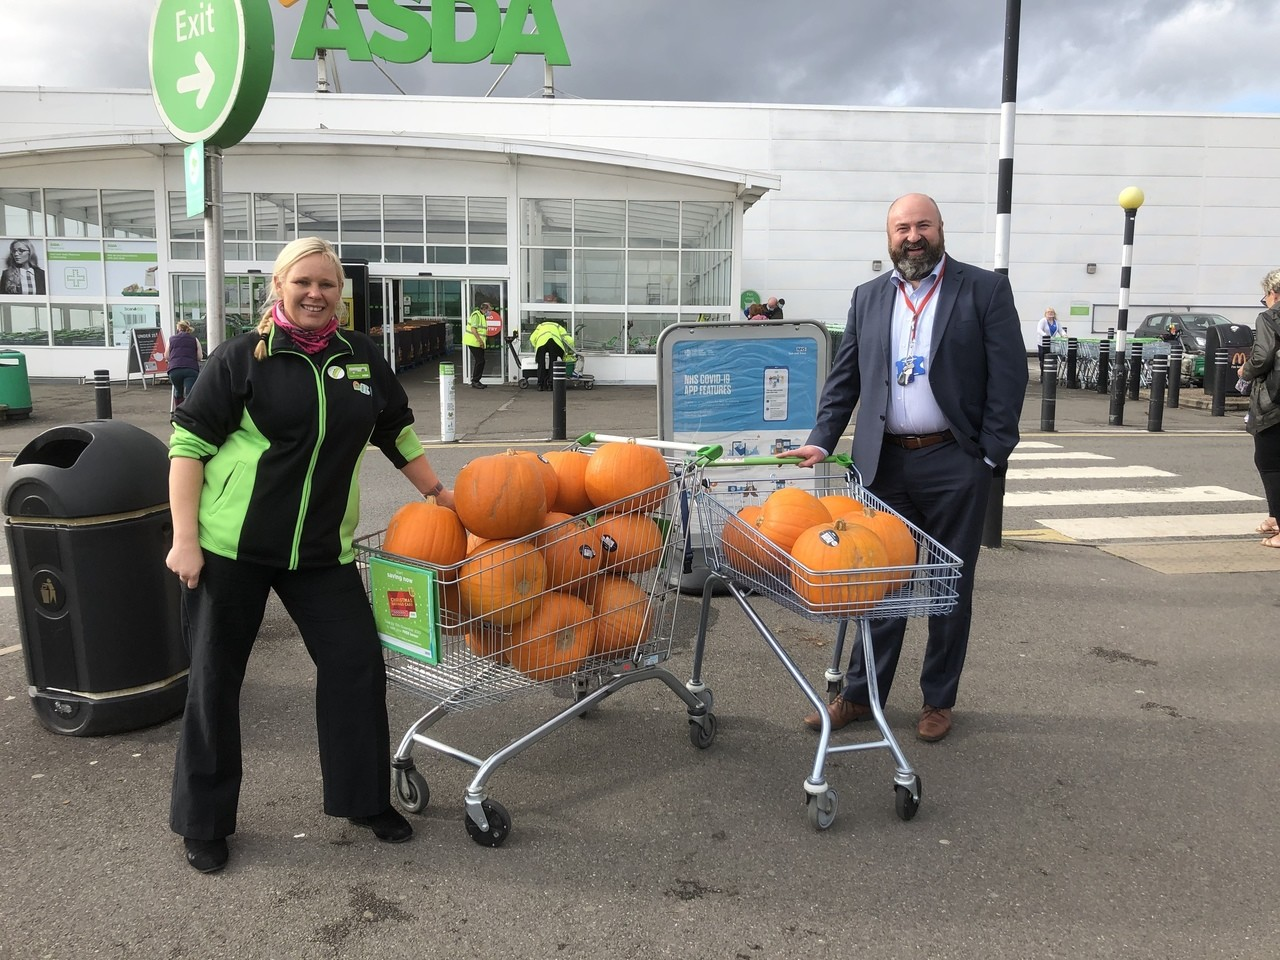 Donation of pumpkins 🎃 for local school | Asda Derby